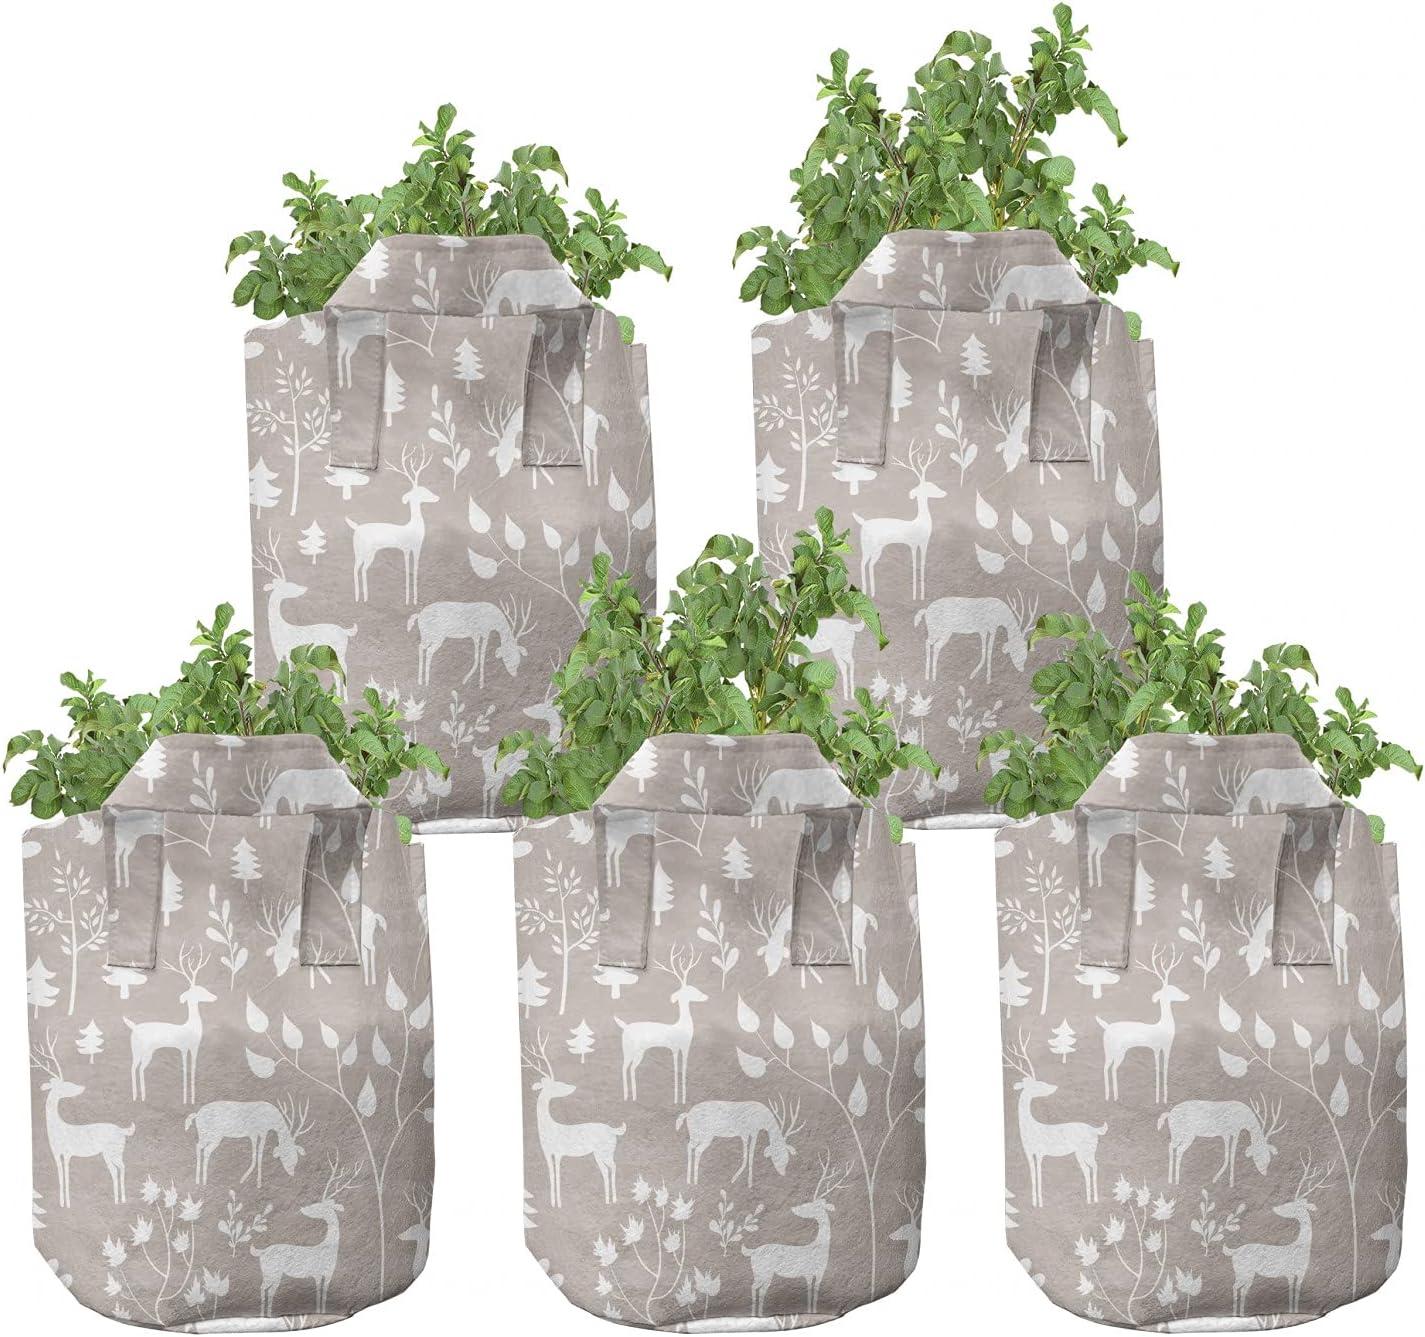 Ambesonne Winter Grow Bags 5-Pack Deer Pines Regular store Popular popular Forest Hea Pastel